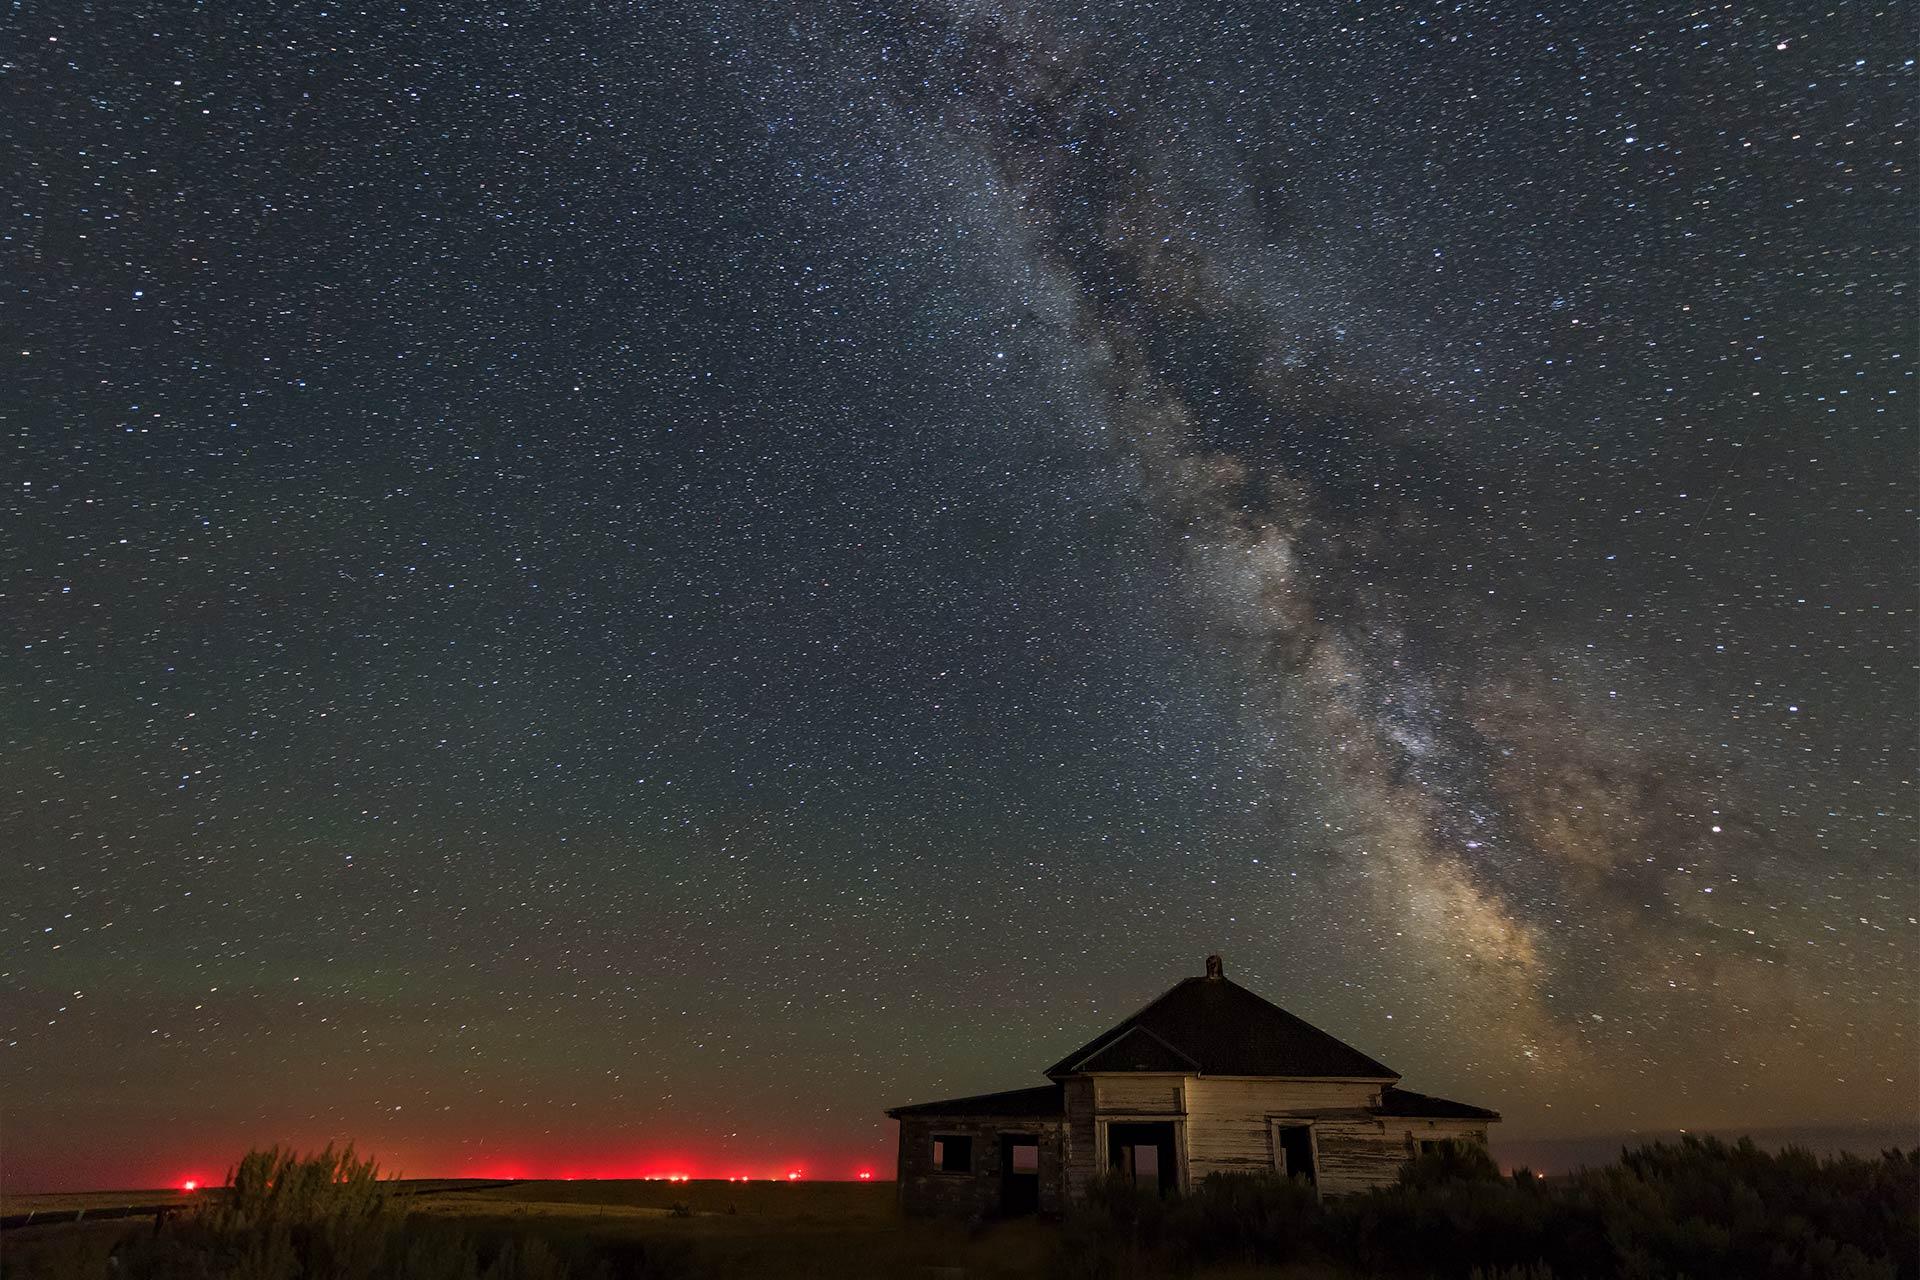 milky-way-night-sky-photography-condon-haunted-house-oregon